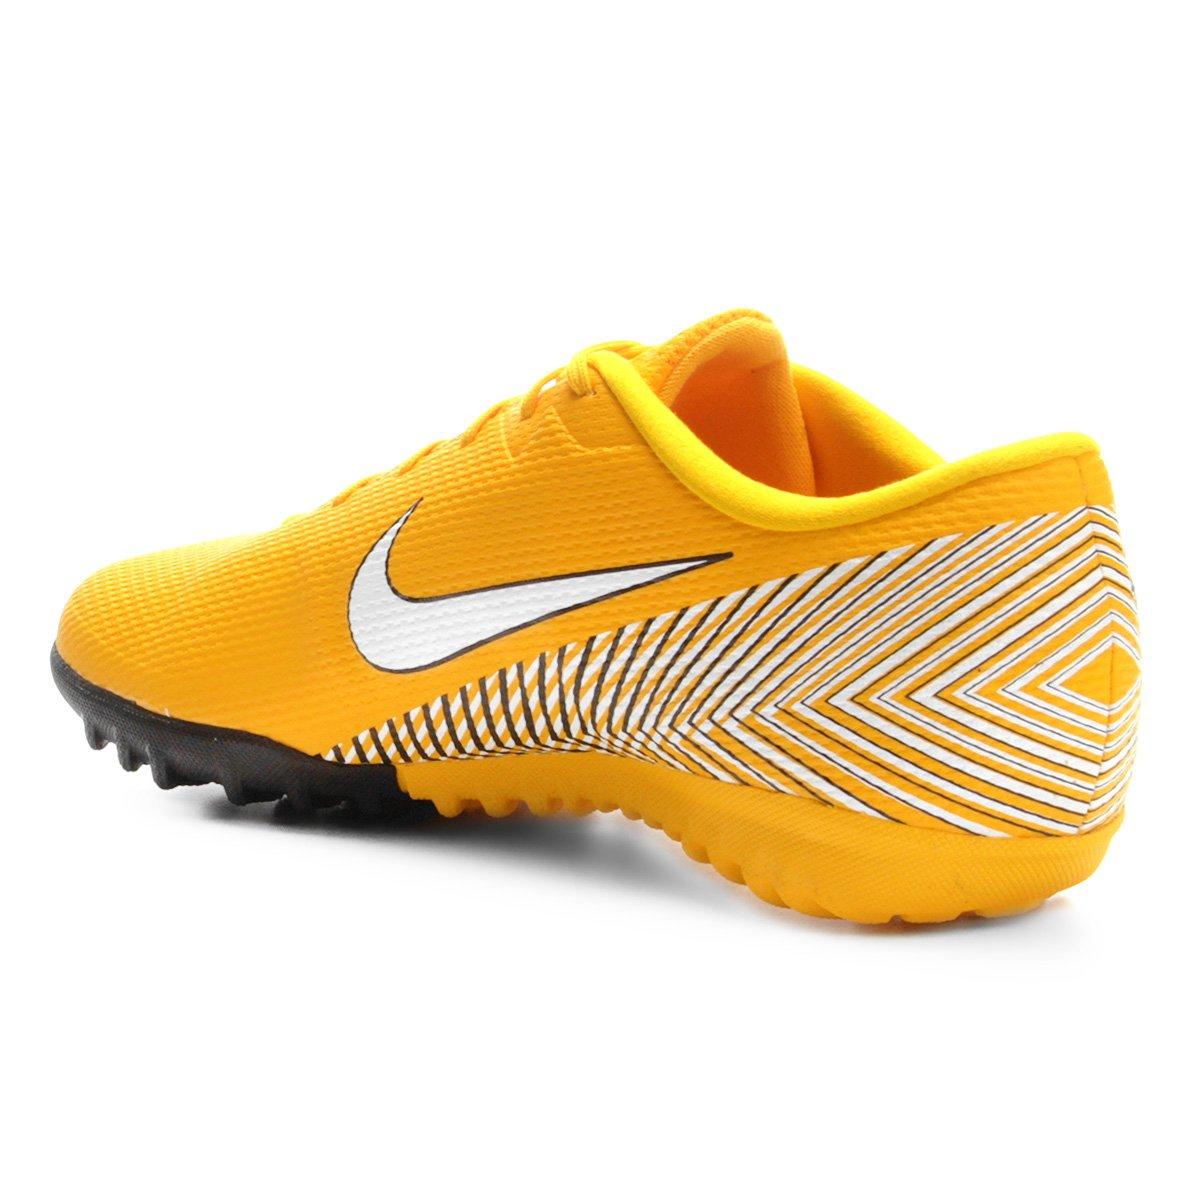 Chuteira Society Nike Mercurial Vapor 12 Academy Neymar TF - Amarelo ... 0c87714dc561e